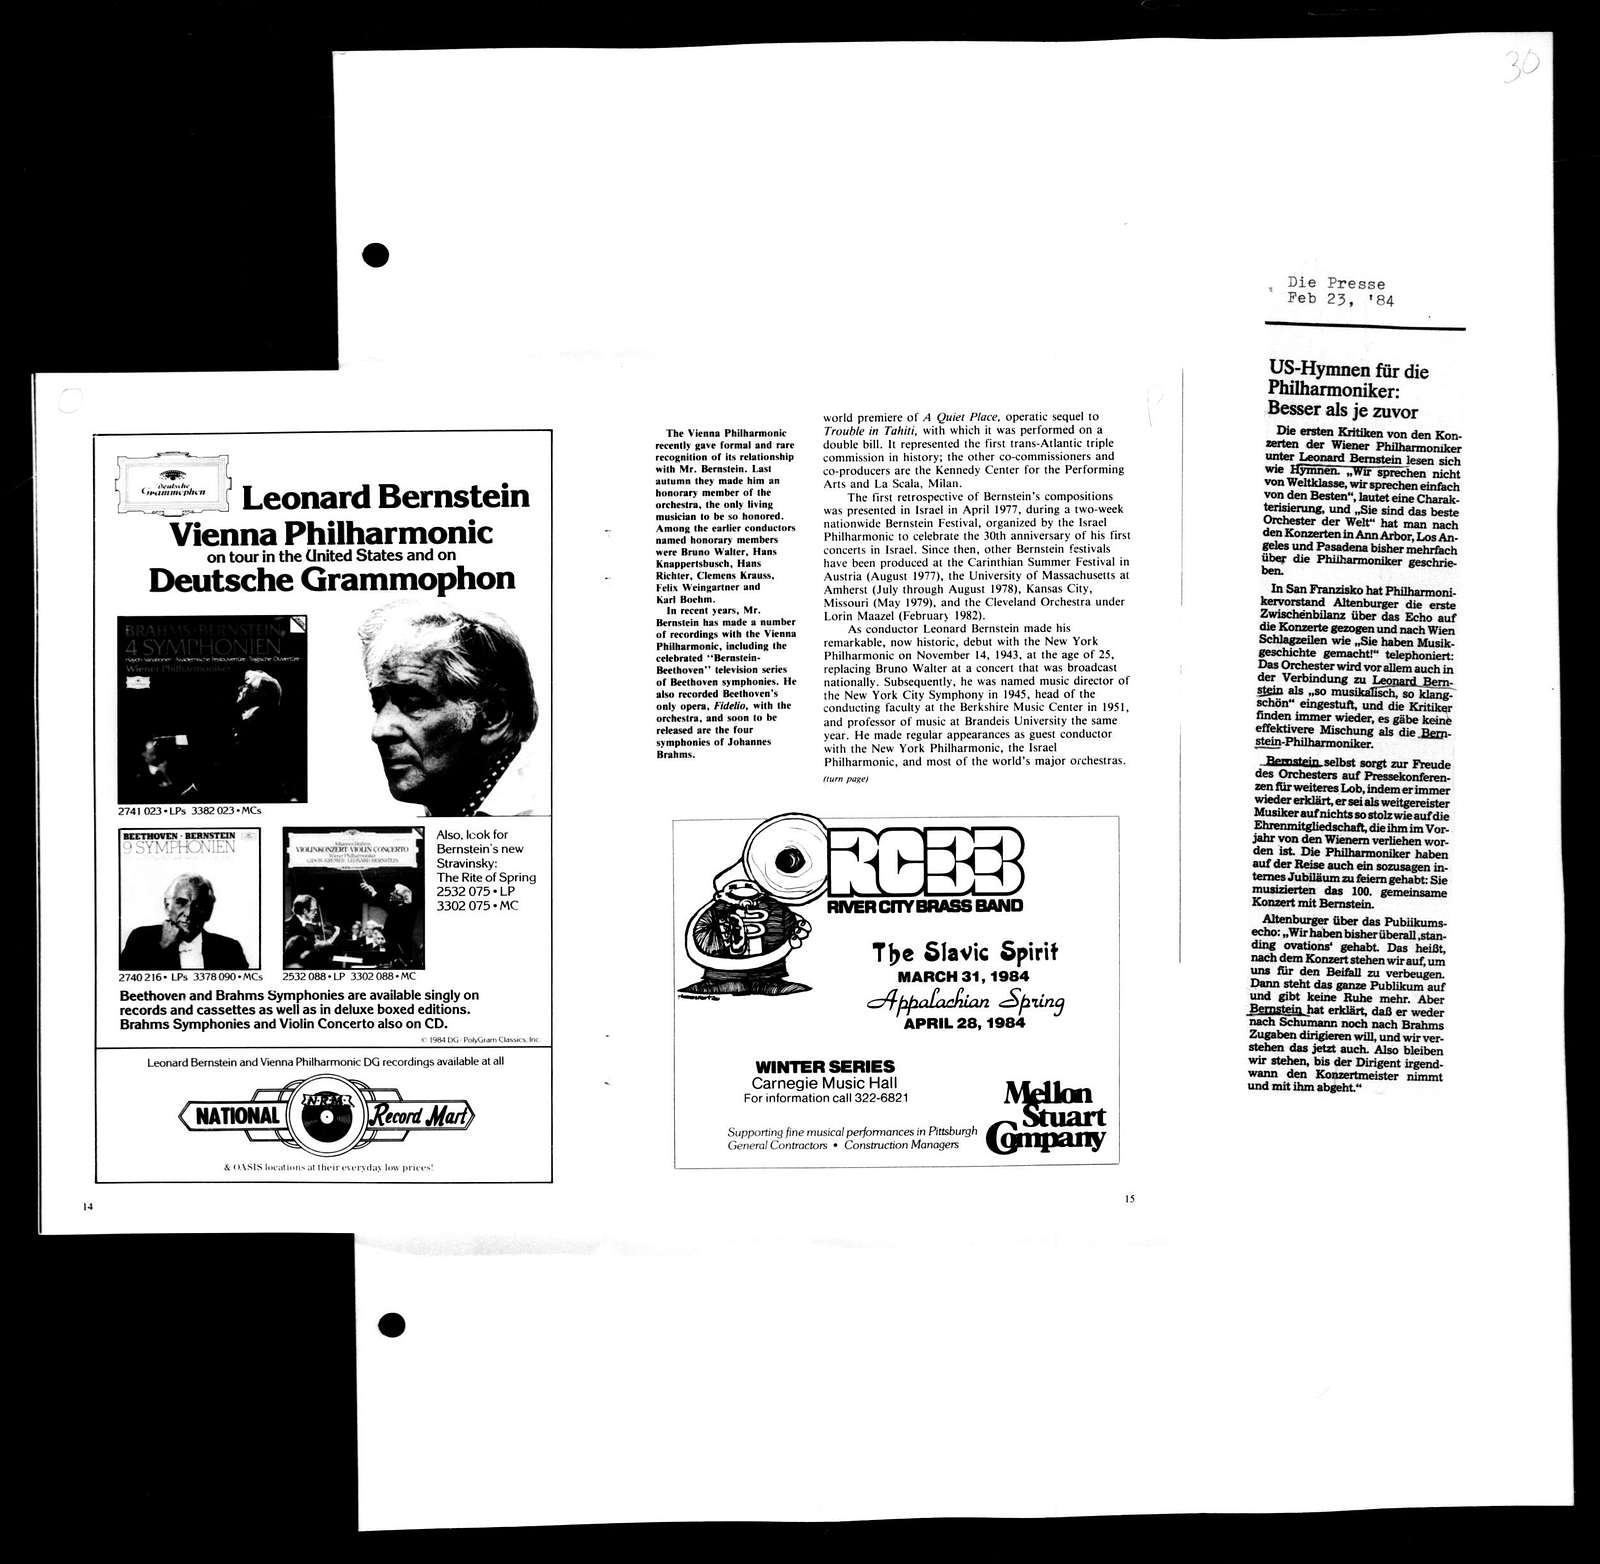 Leonard Bernstein Scrapbook: Vol. 109. Feb. 19, 1984-April 1, 1984